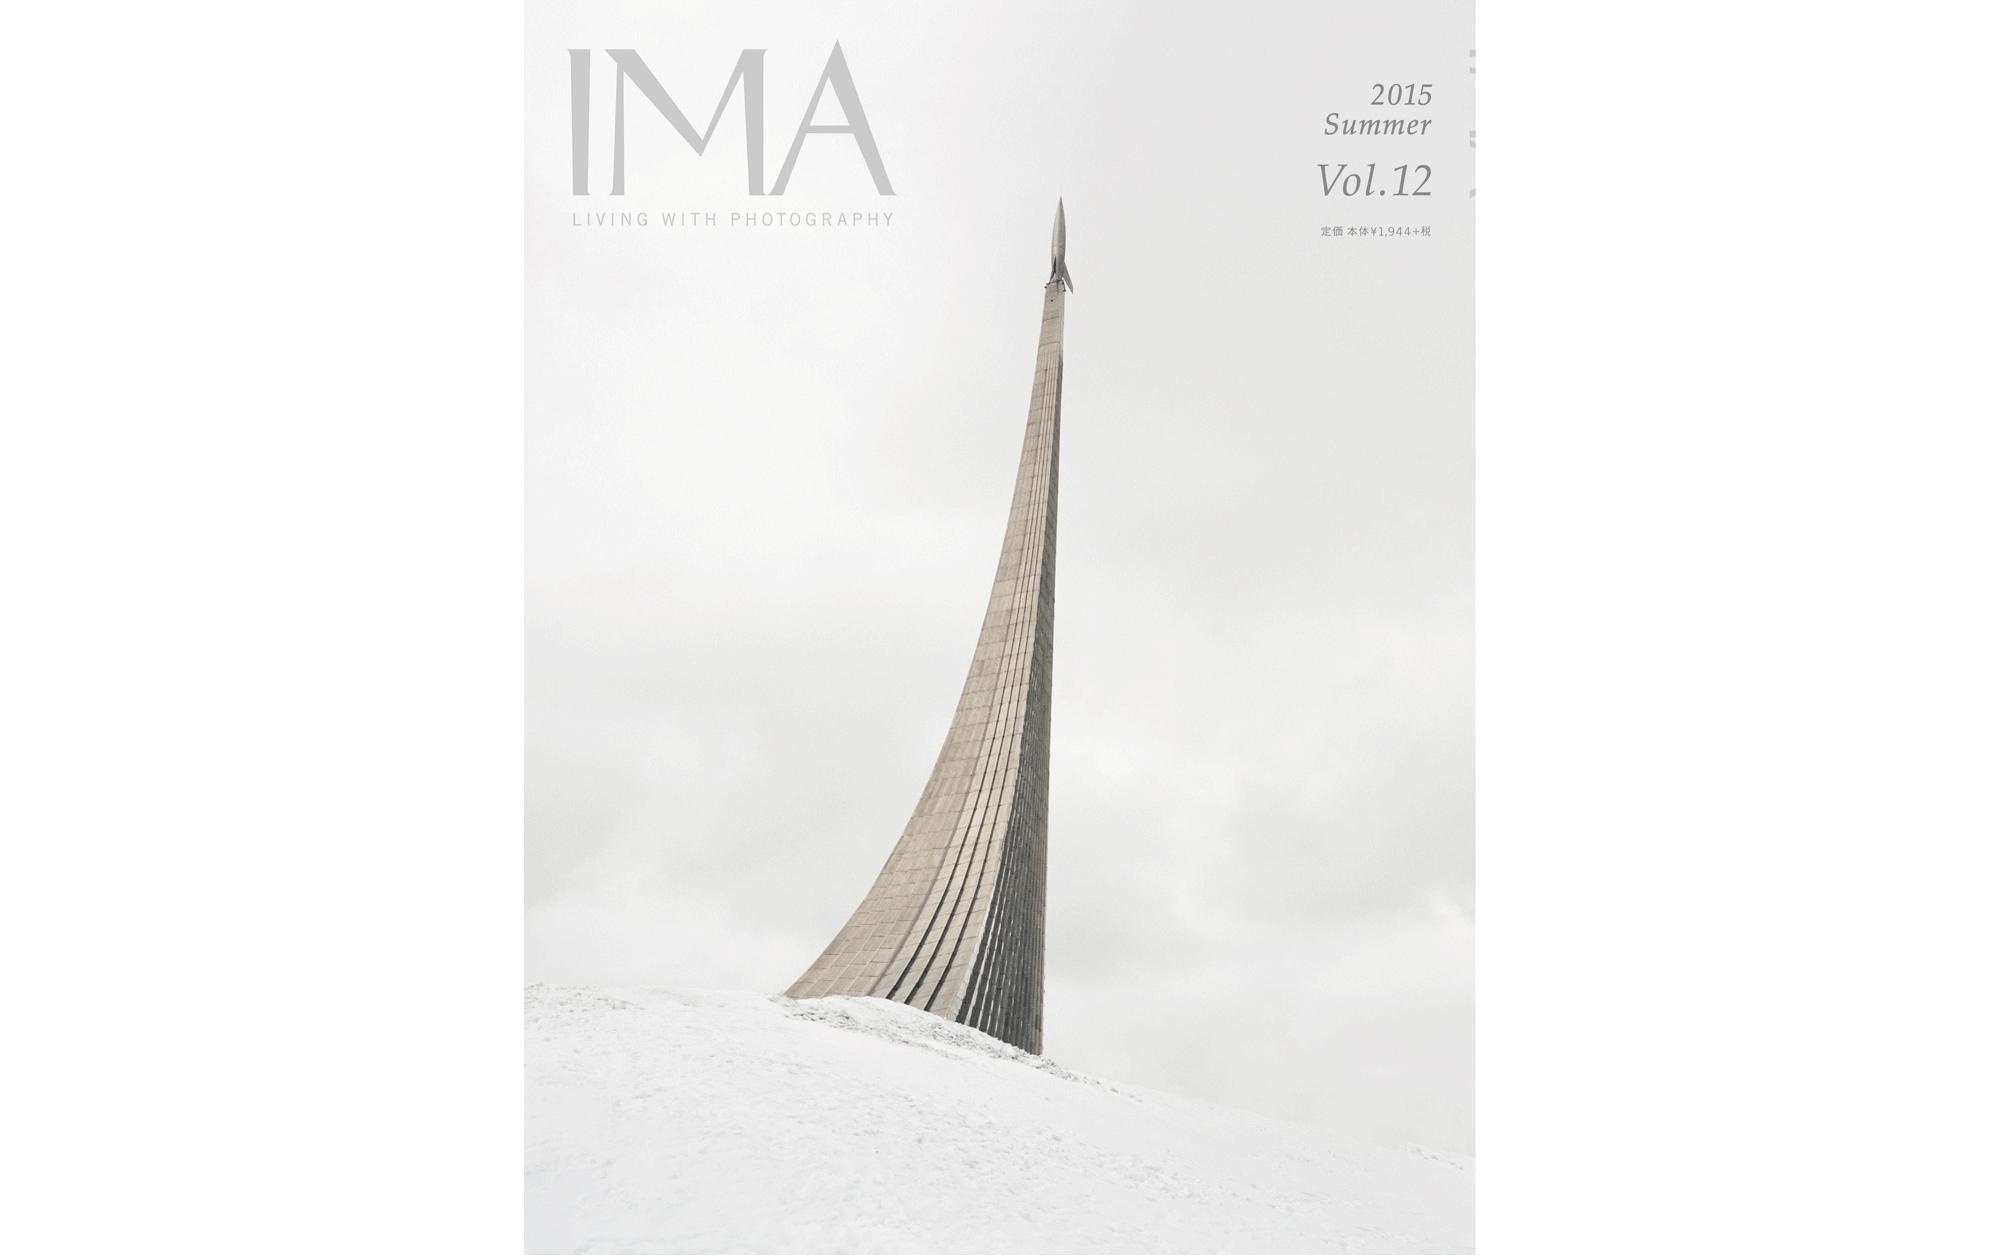 IMA 2015 Summer Vol.12